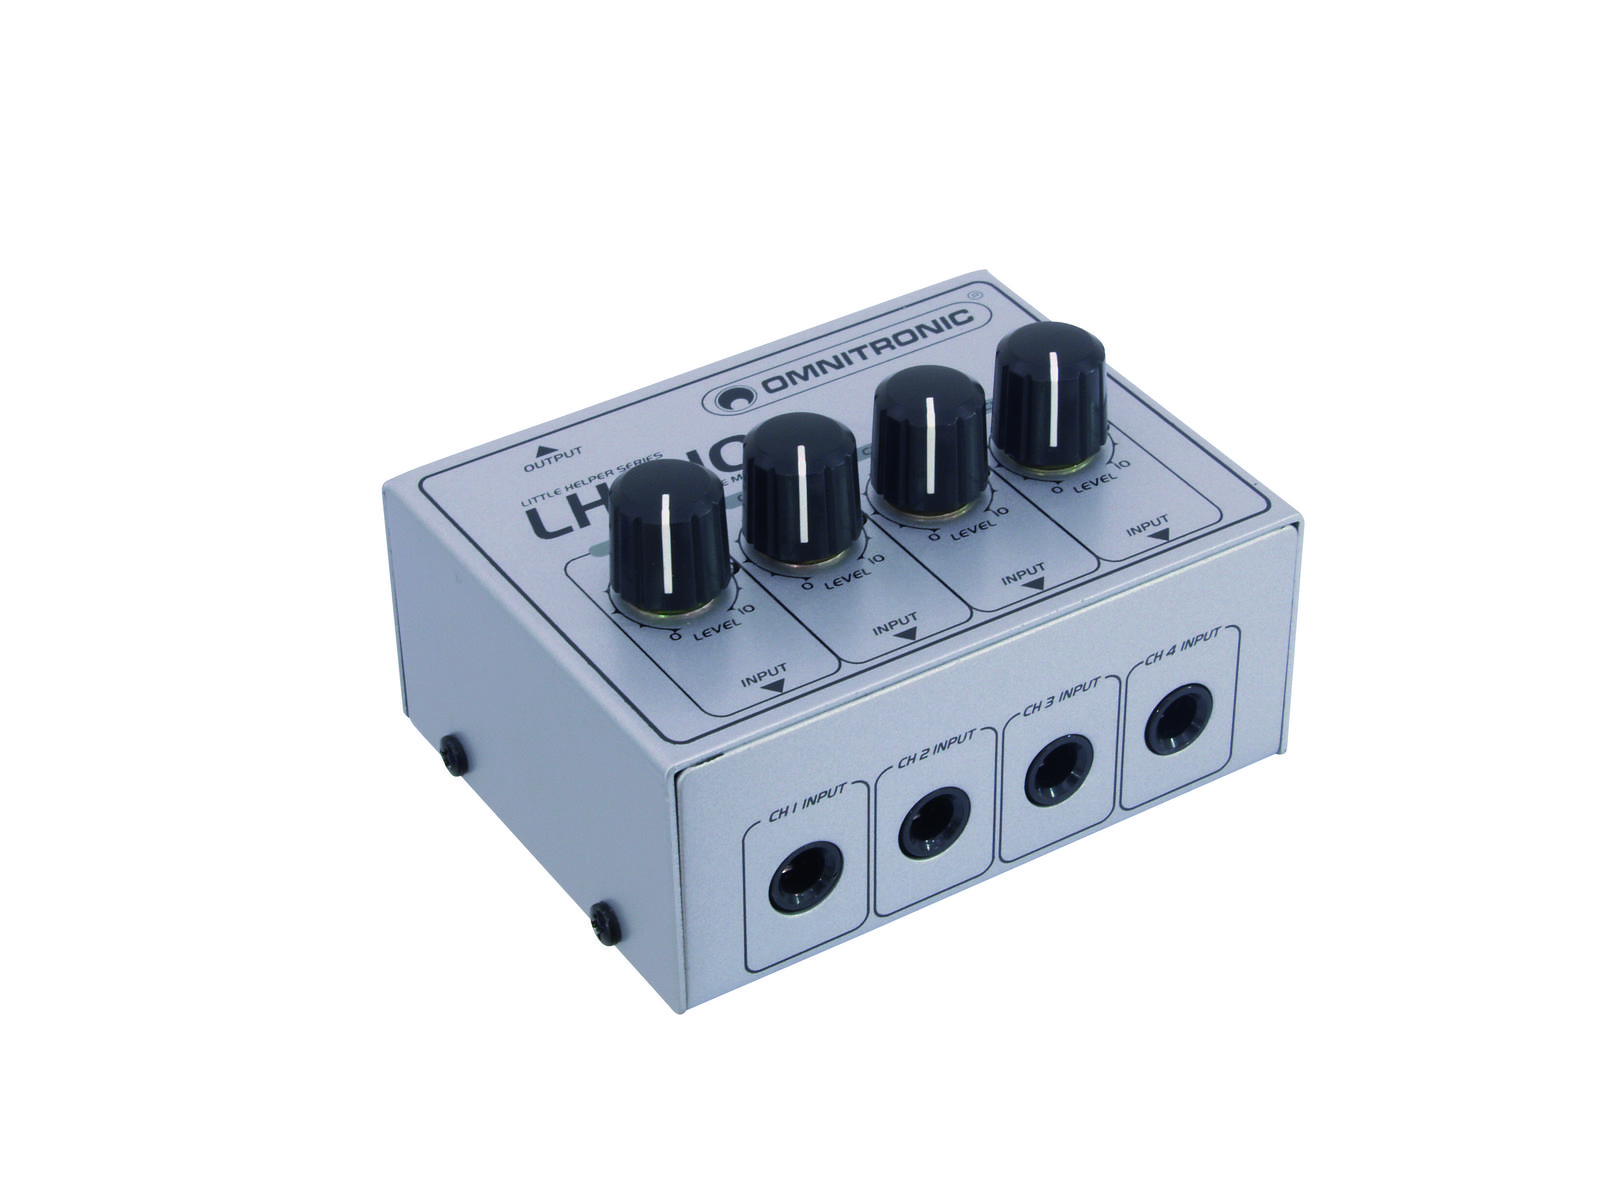 OMNITRONIC LH-010, 4 Kanal passiver Mixer